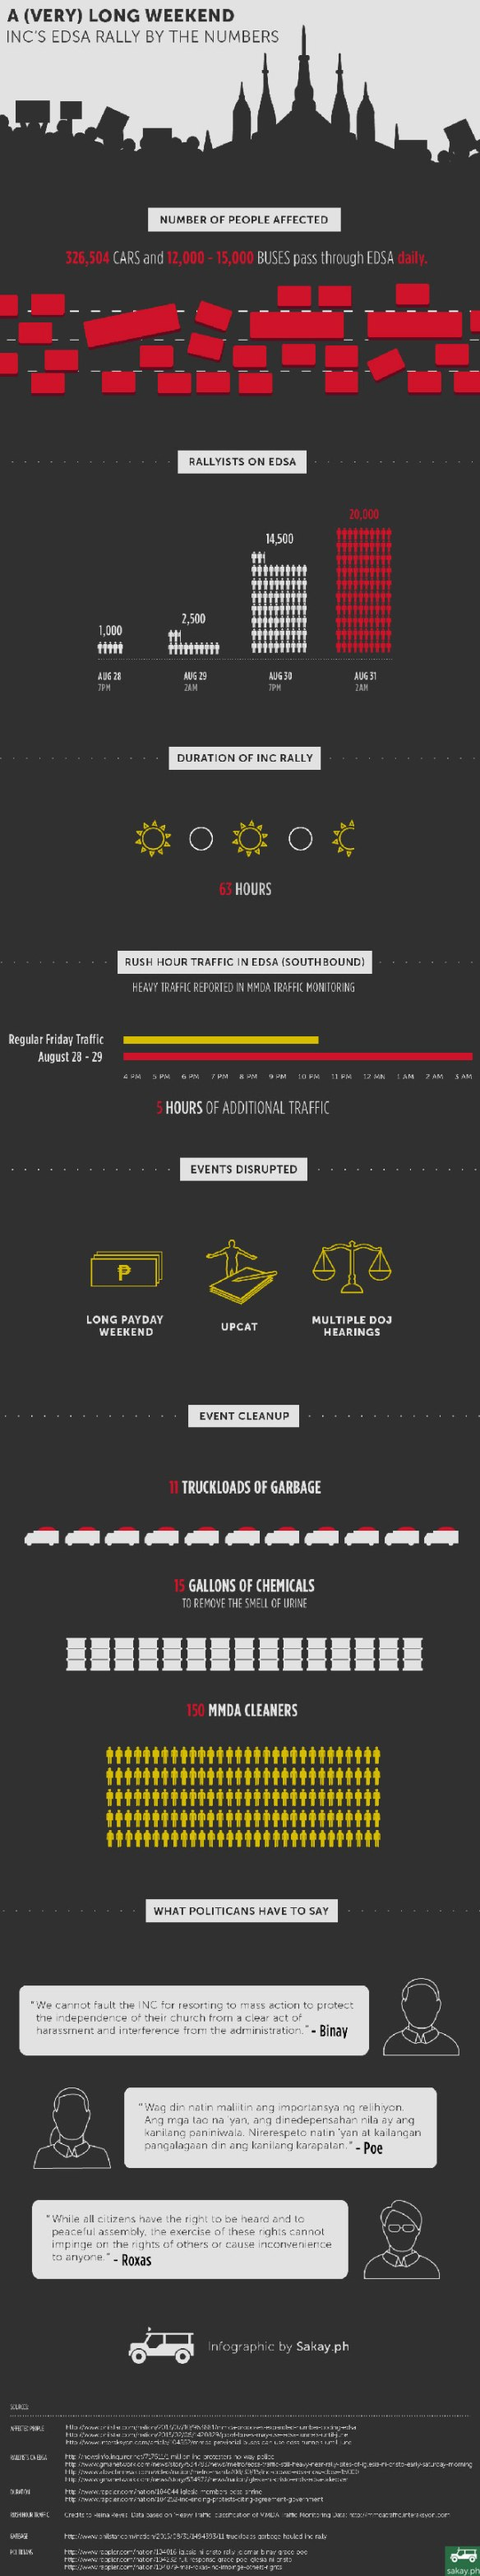 edsa_carmageddon_infographic